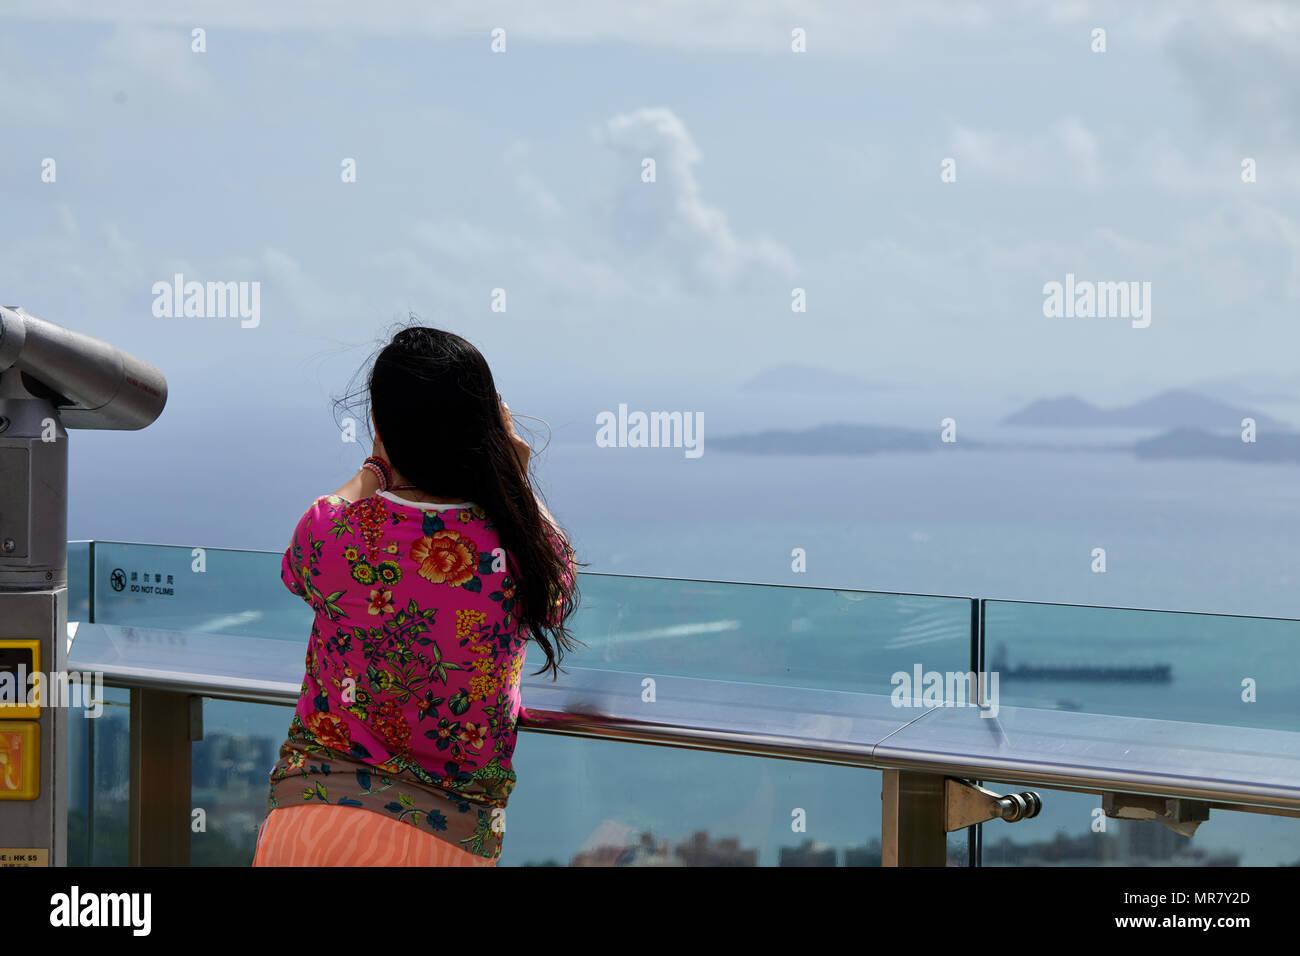 A sightseer looking towards Lamma Island, Hong Kong, viewed from Victoria Peak on Hong Kong Island and overlooking the city. - Stock Image